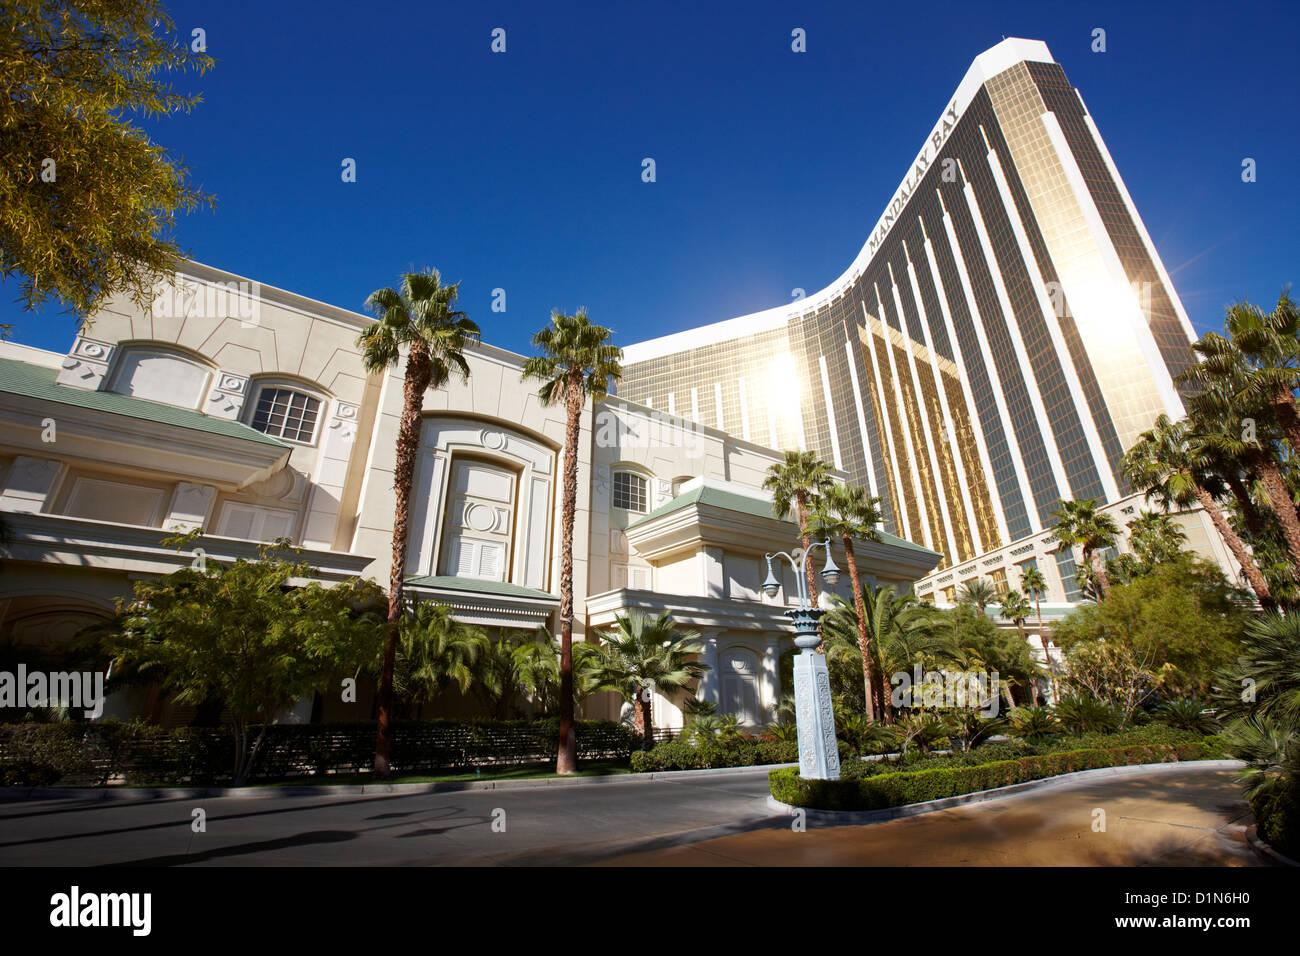 the four seasons hotel at mandalay bay resort hotel and casino Las Vegas Nevada USA Stock Photo